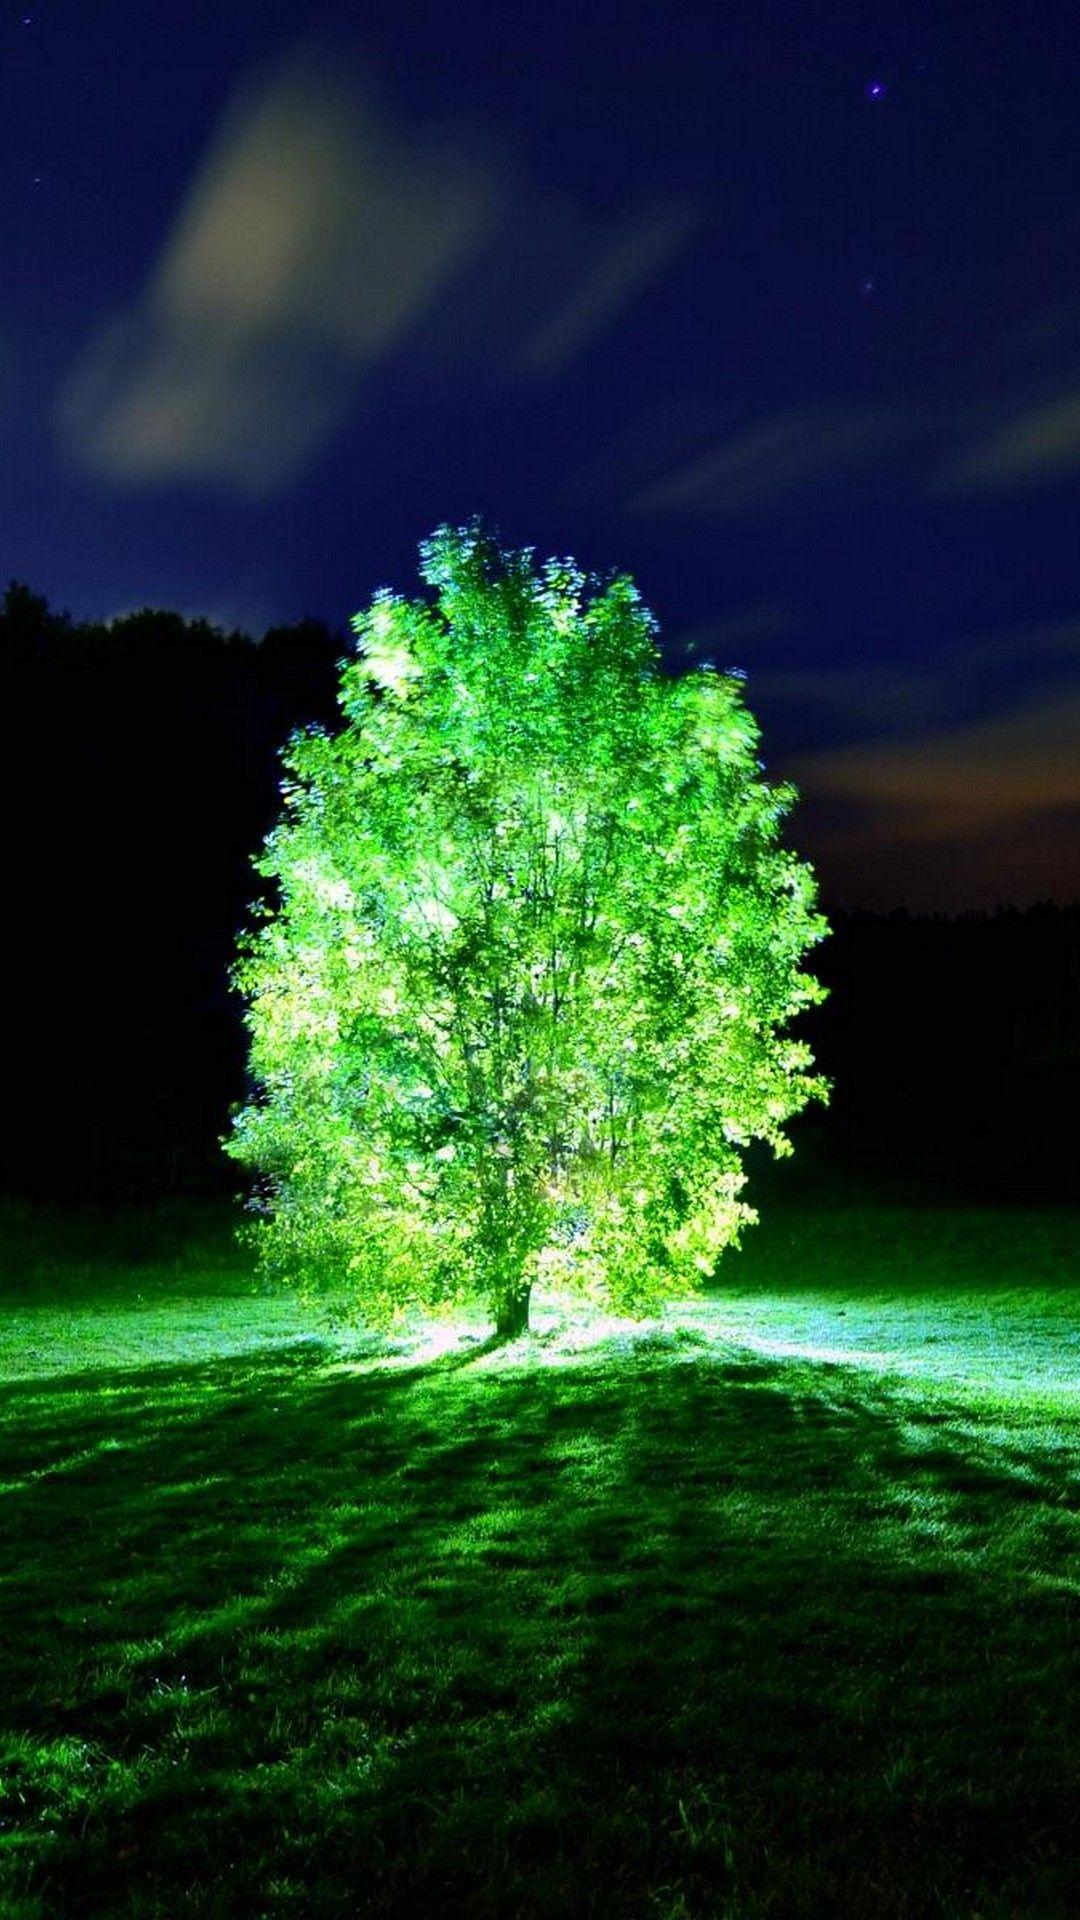 Trees Glowing In The Dark 壁紙 風景 木